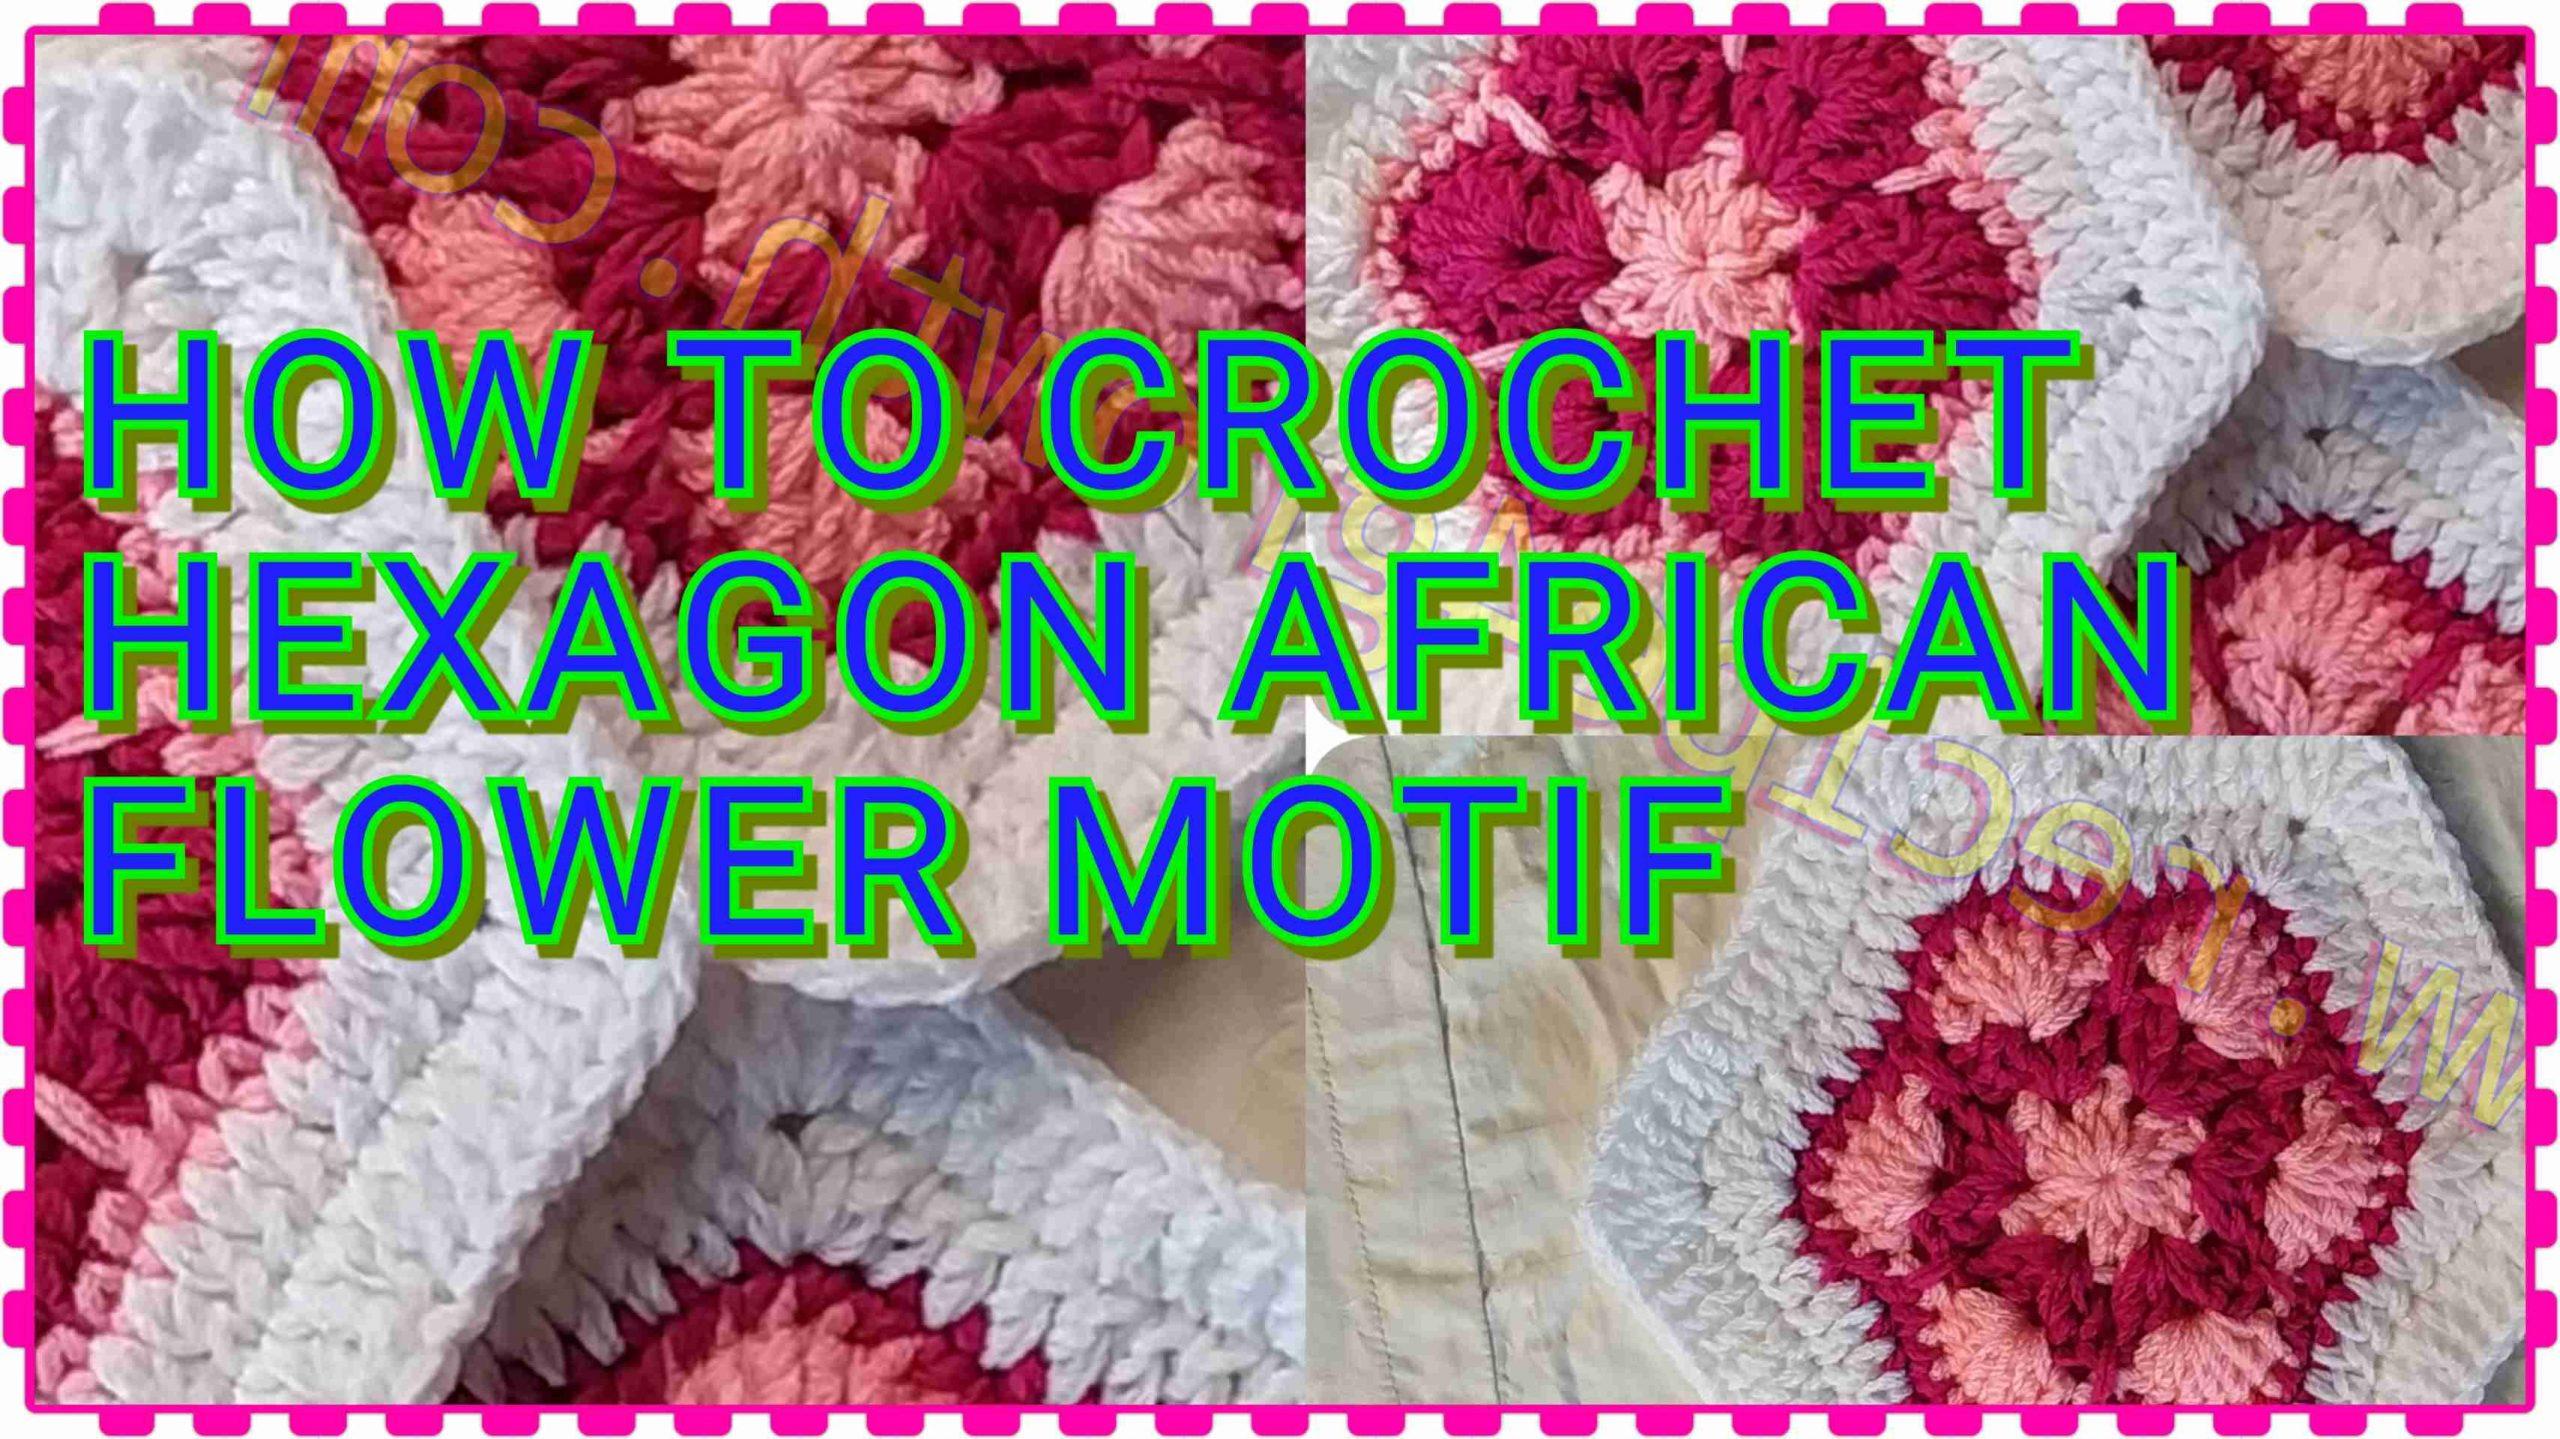 HOW TO CROCHET HEXAGON AFRICAN FLOWER MOTIF